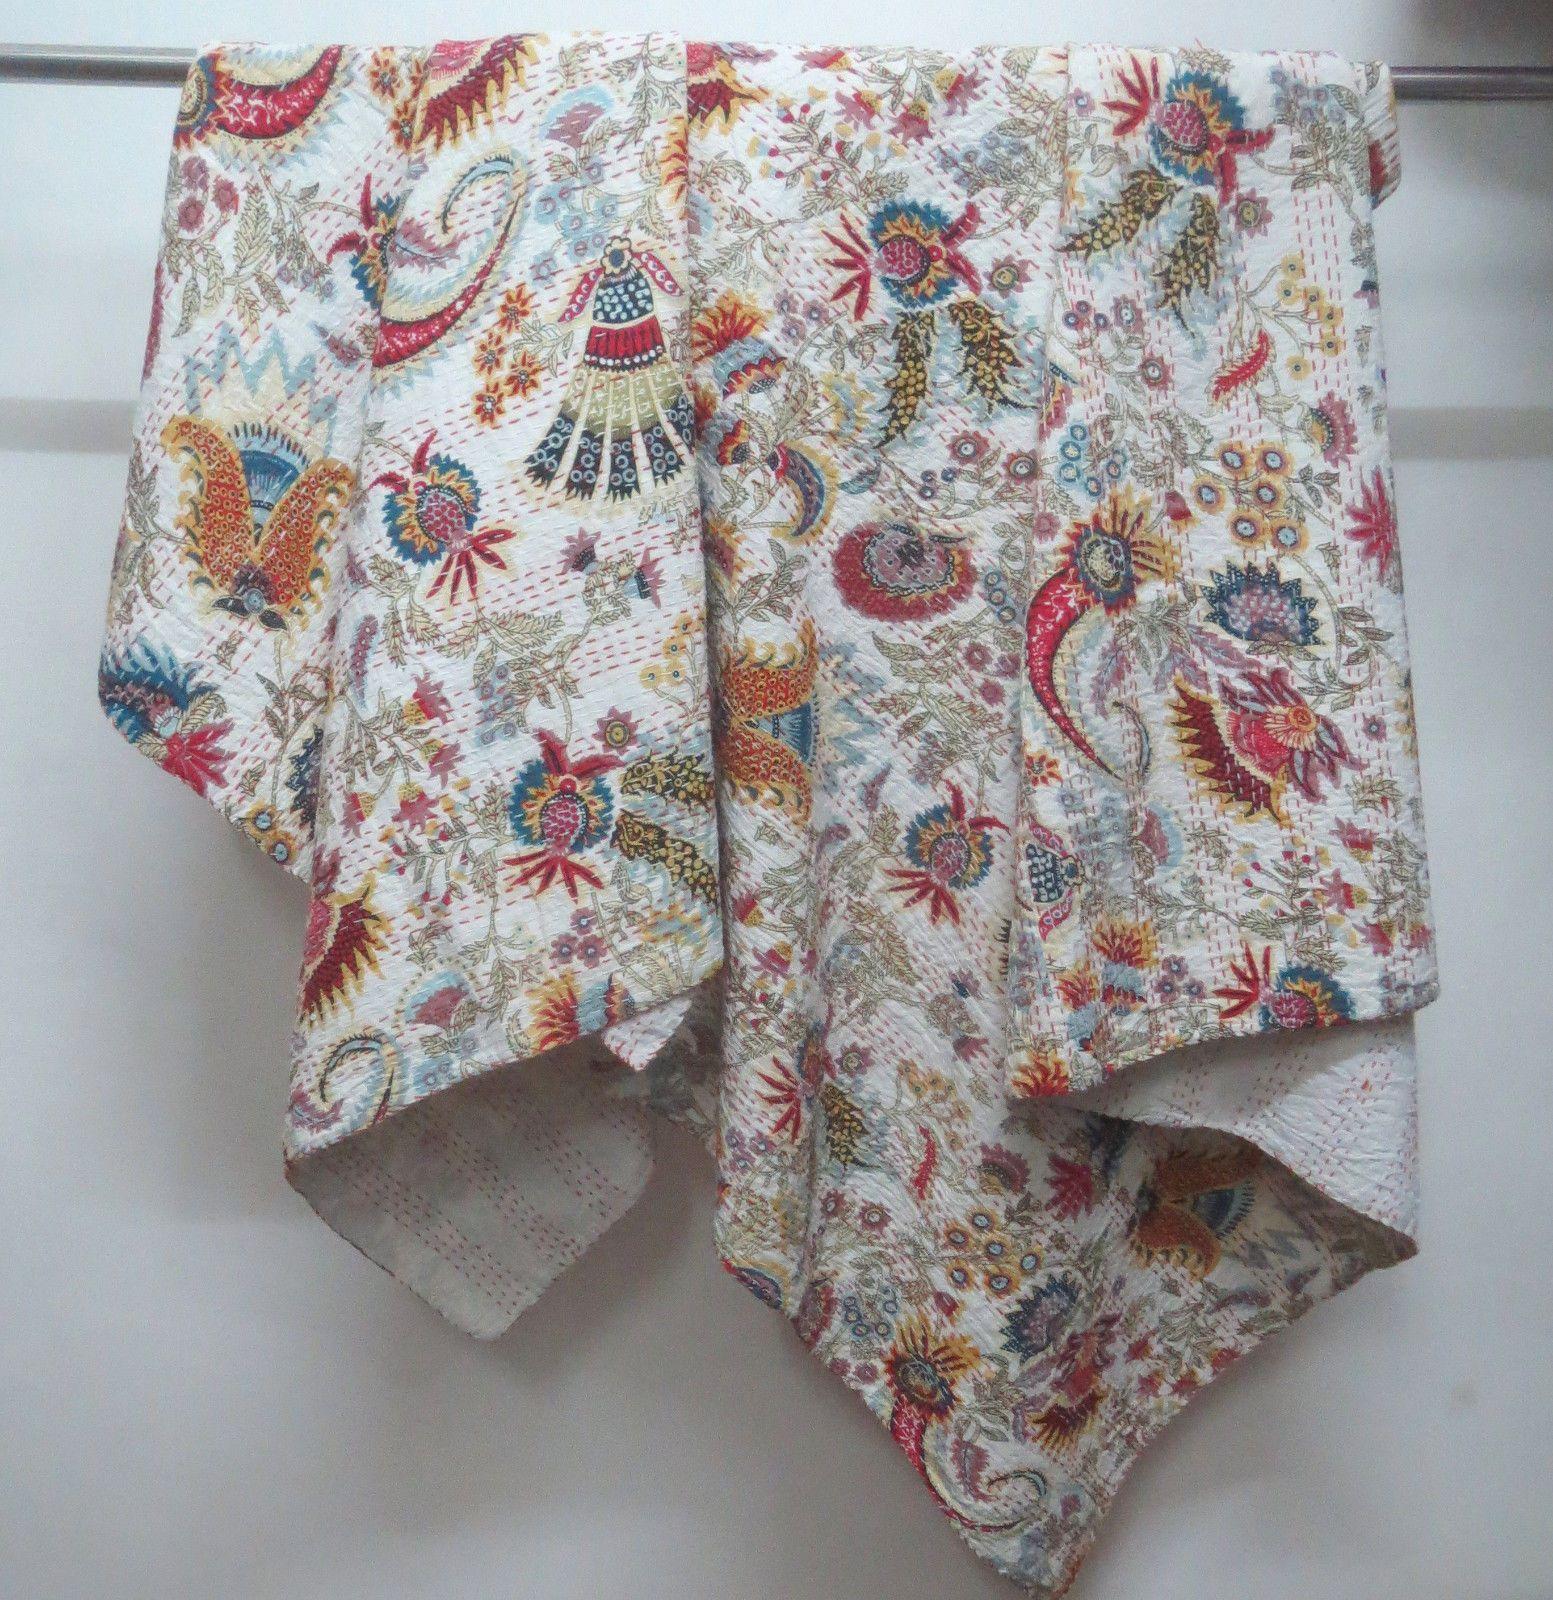 Quilts handmade queen antique indian quilt jaipur blanket throw sari